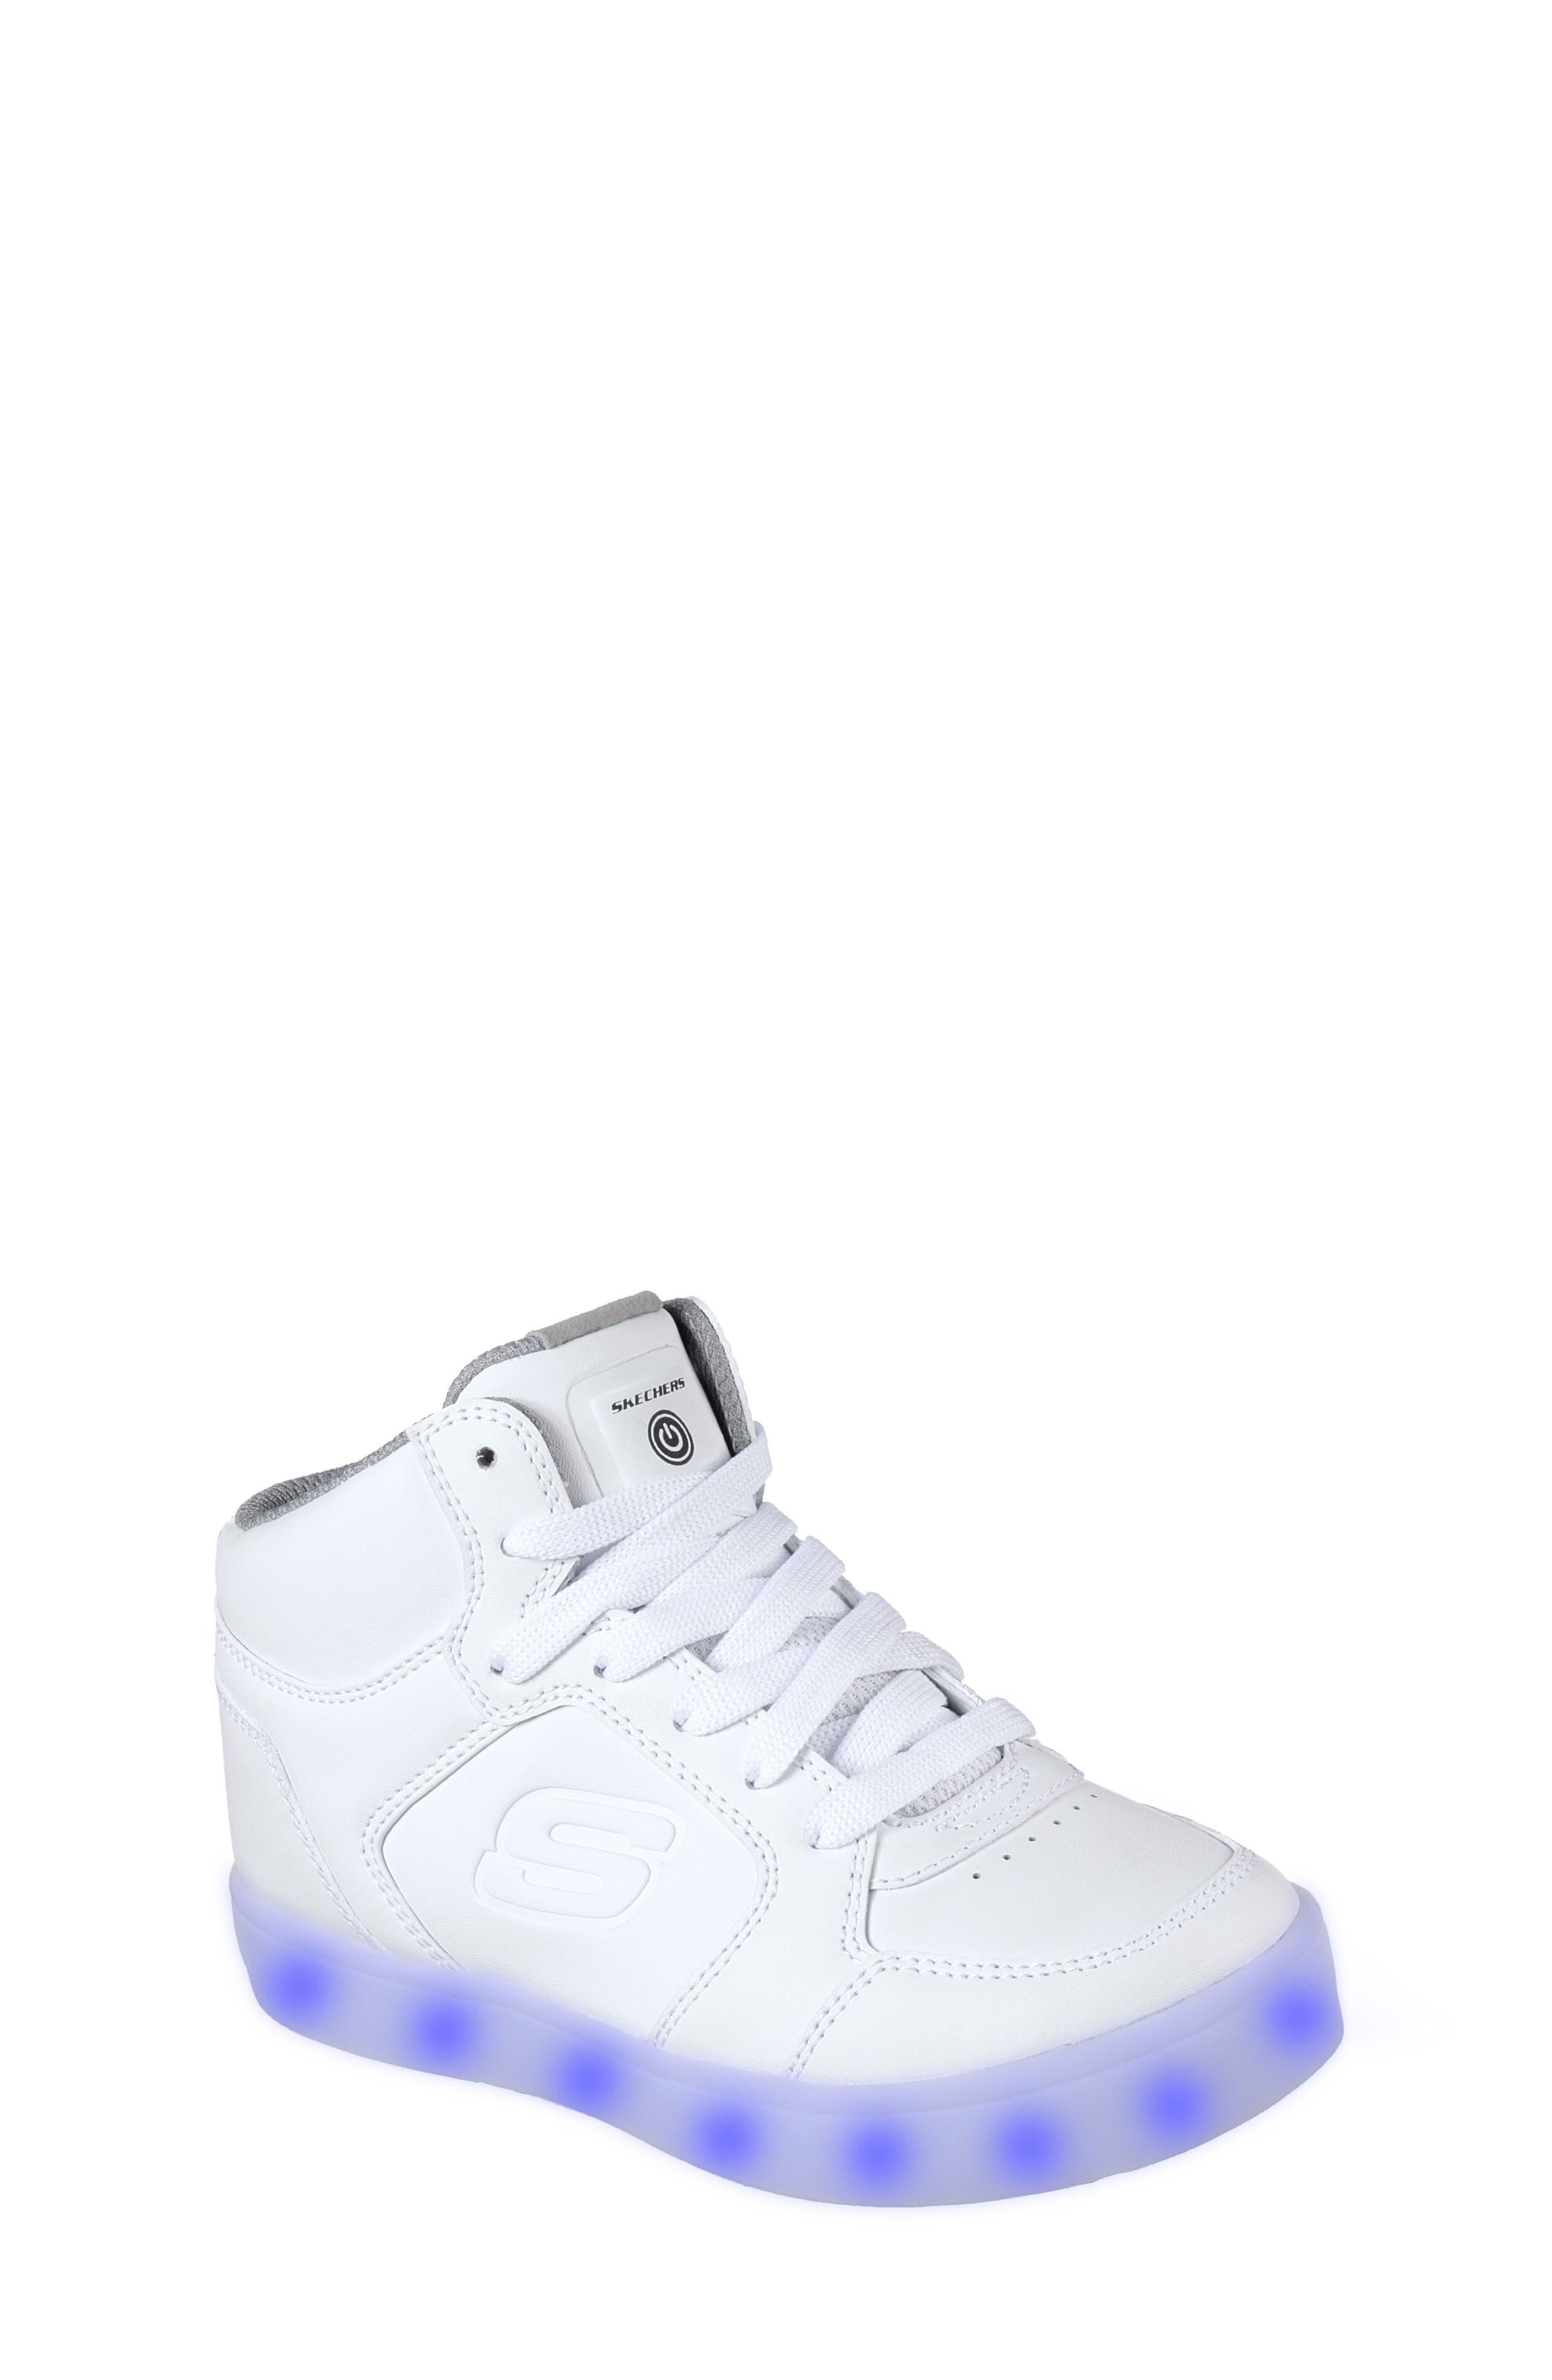 Alternate Image 3  - SKECHERS Energy Lights Sneaker (Toddler, Little Kid & Big Kid)